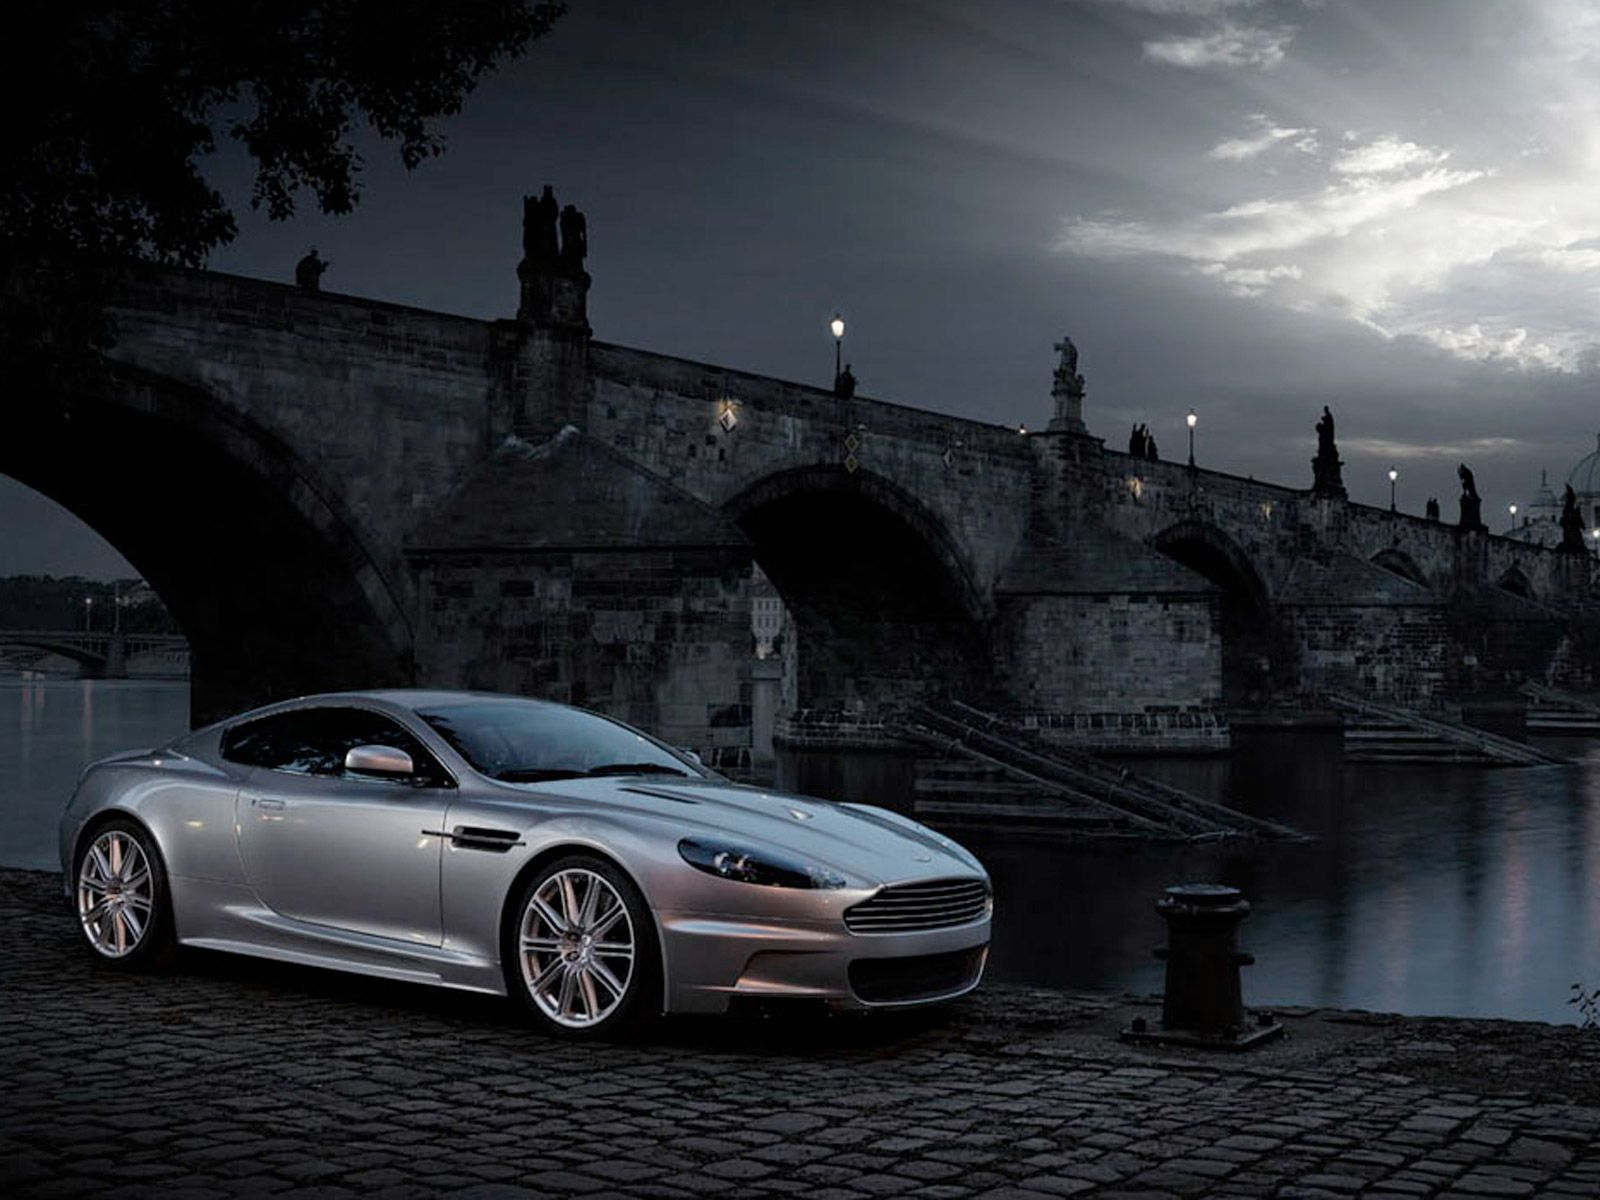 Power Beauty Soul Aston Martin Dbs Aston Martin Dbs Aston Martin Aston Martin Dbs V12